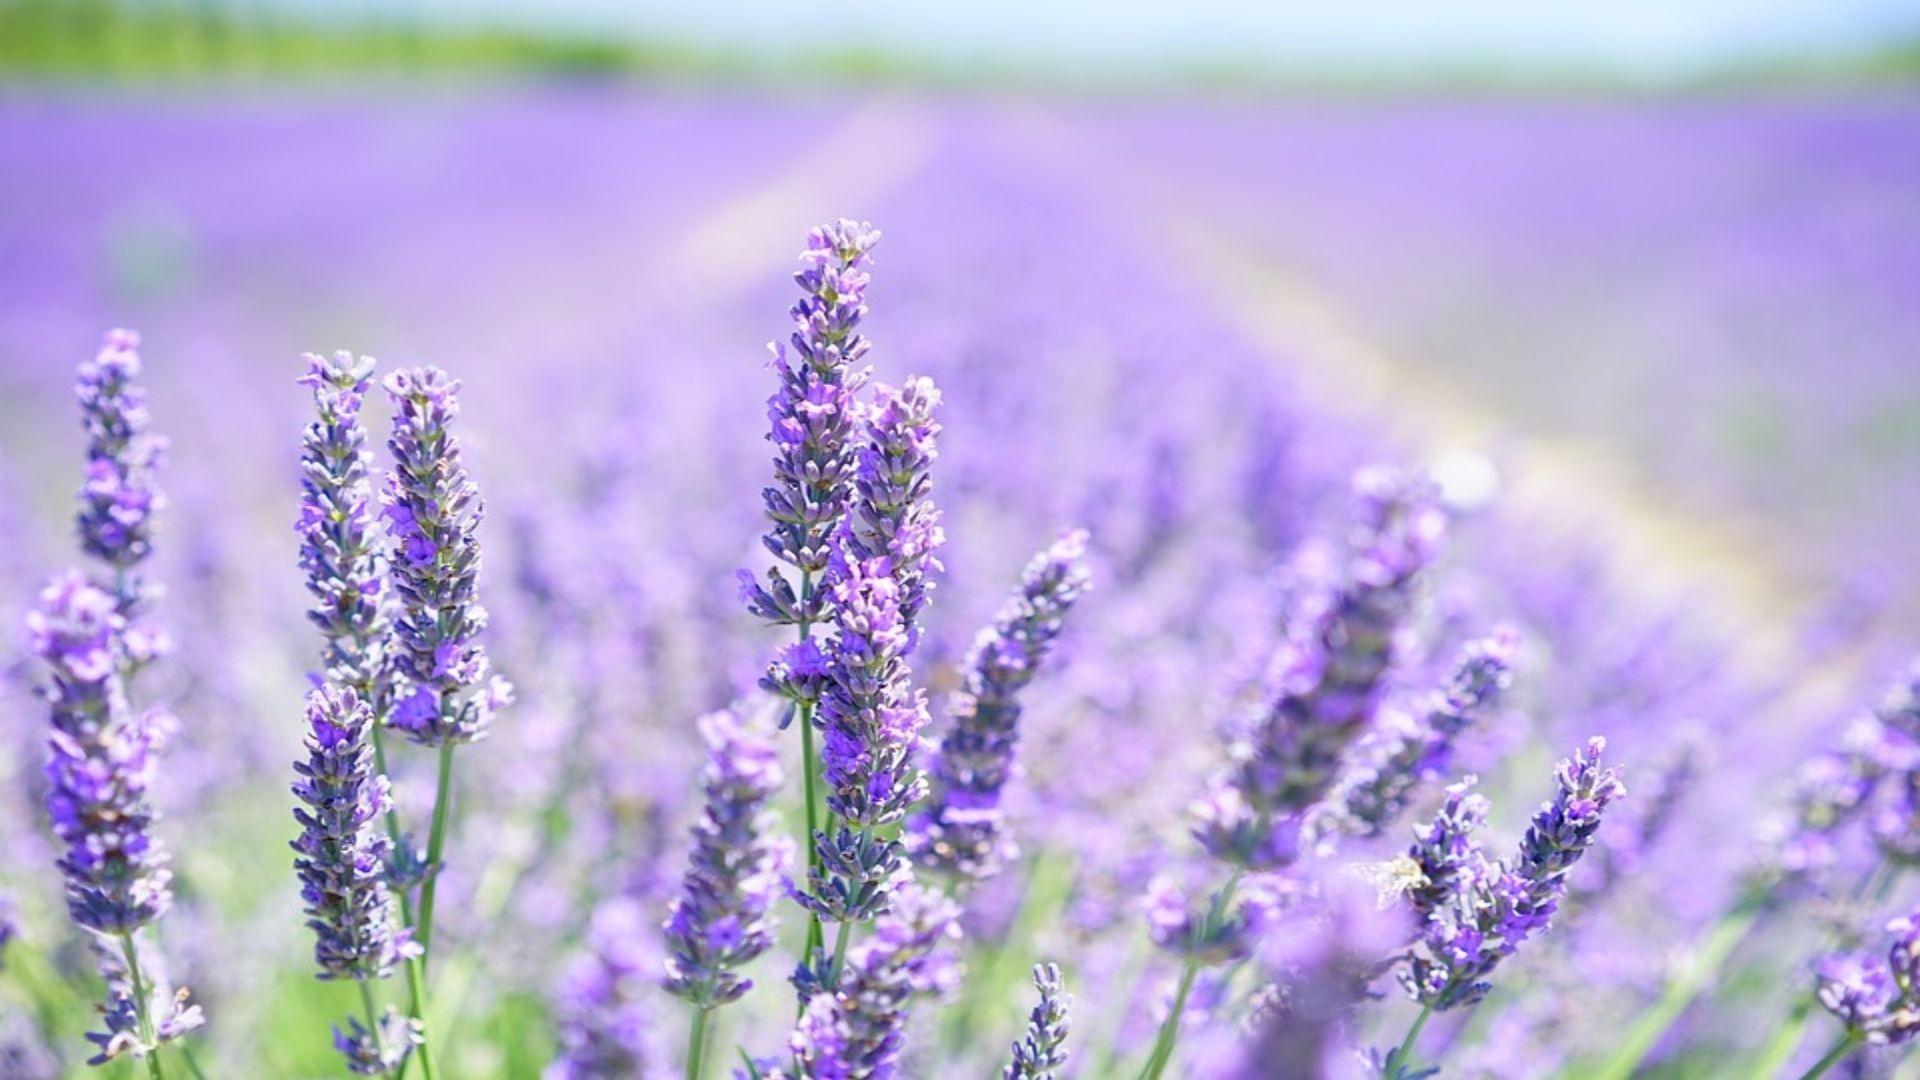 lavender-blossom-1595581_960_720 (1) (1)